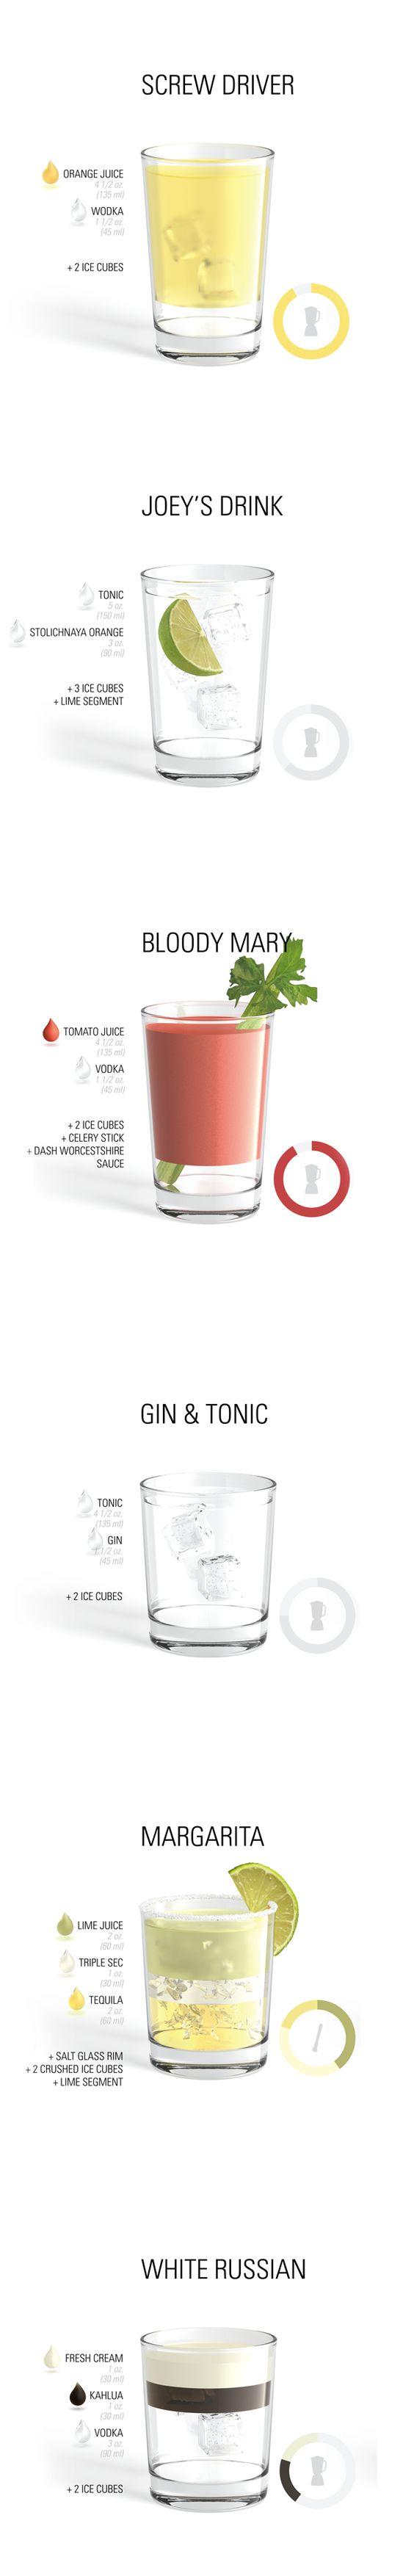 Cocktail Poster by Konstantin Datz